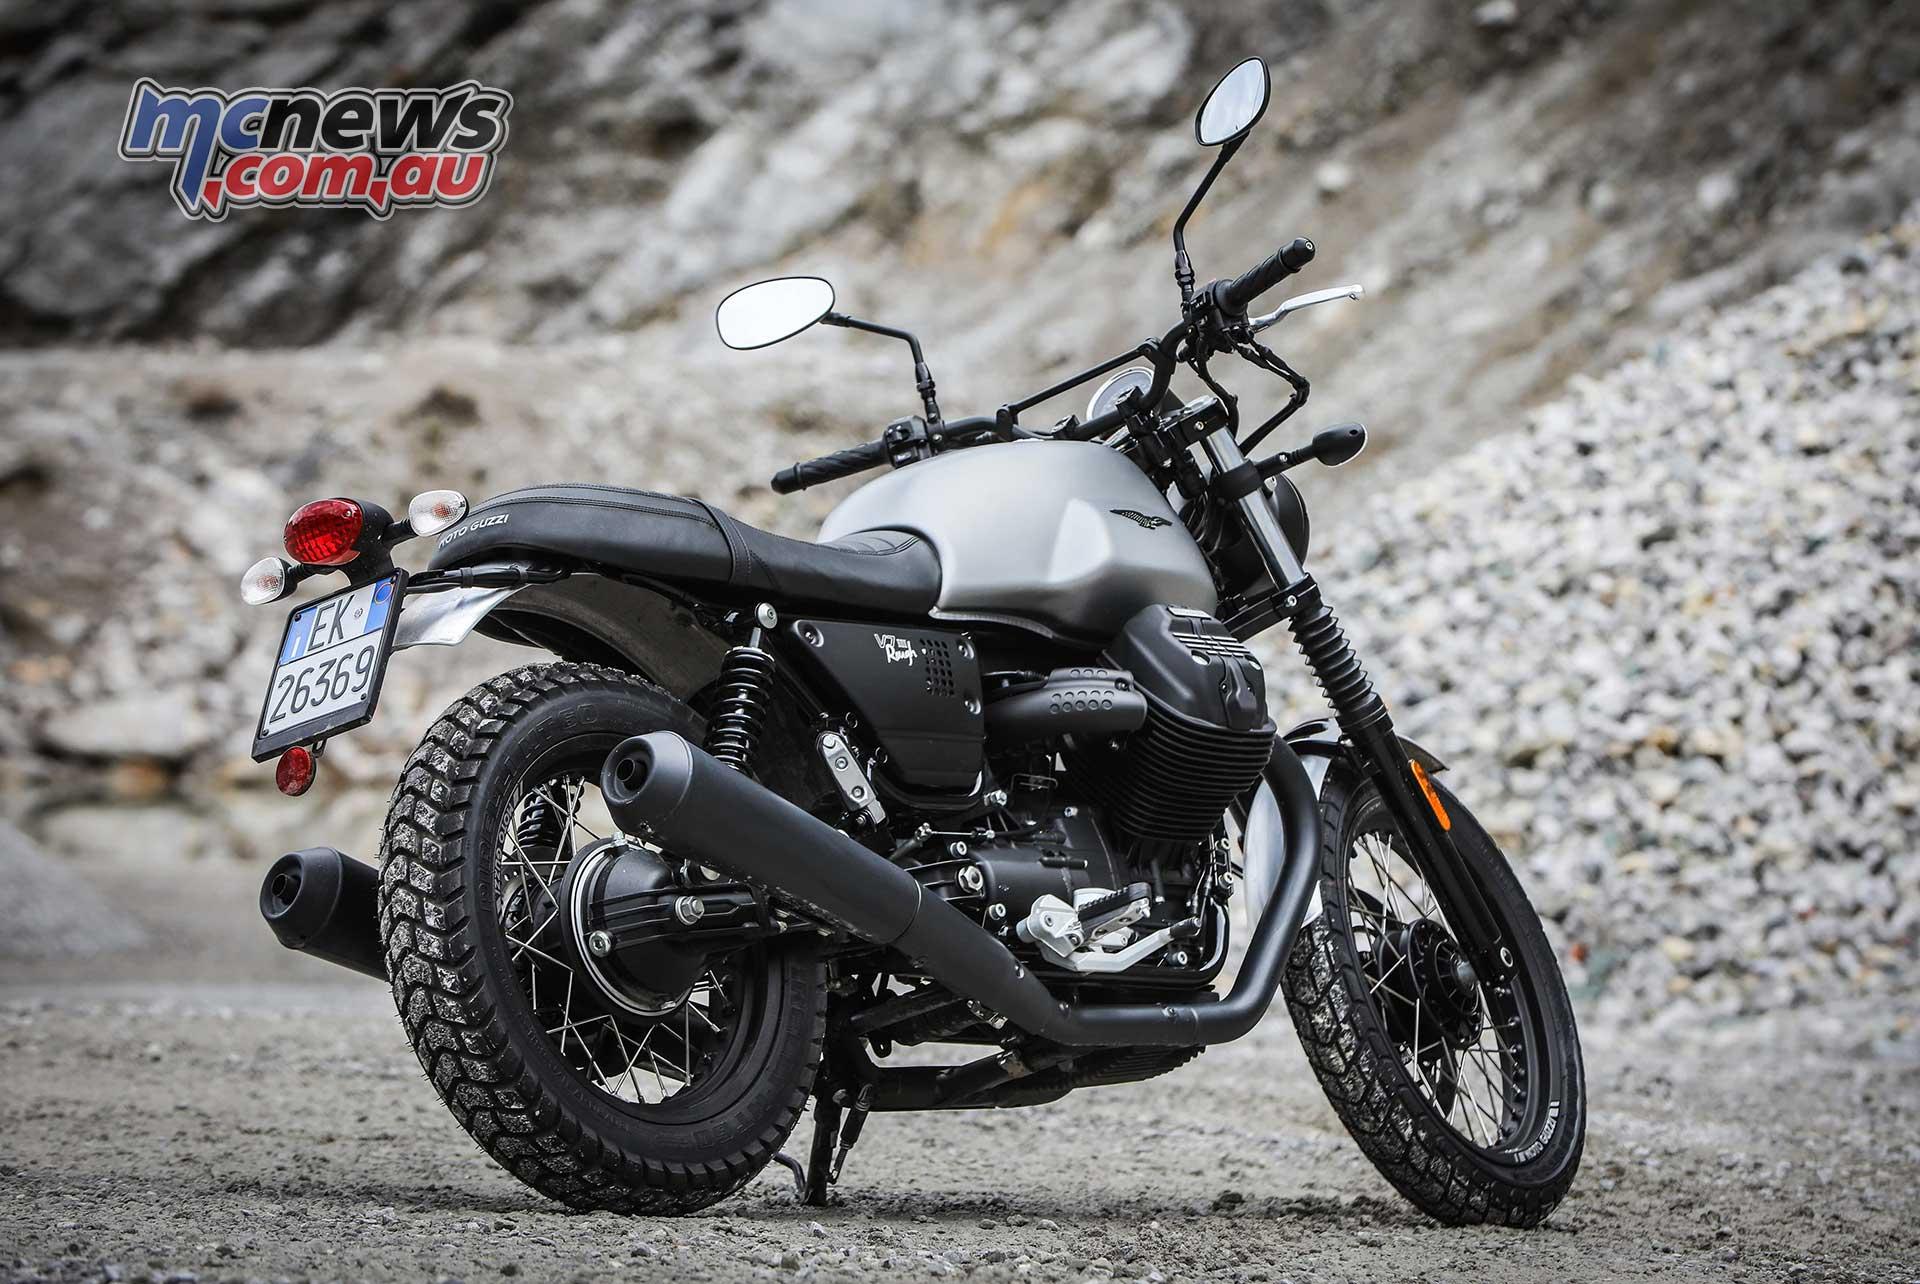 Moto Guzzi V7 III Limited Range Now On Sale In Australia